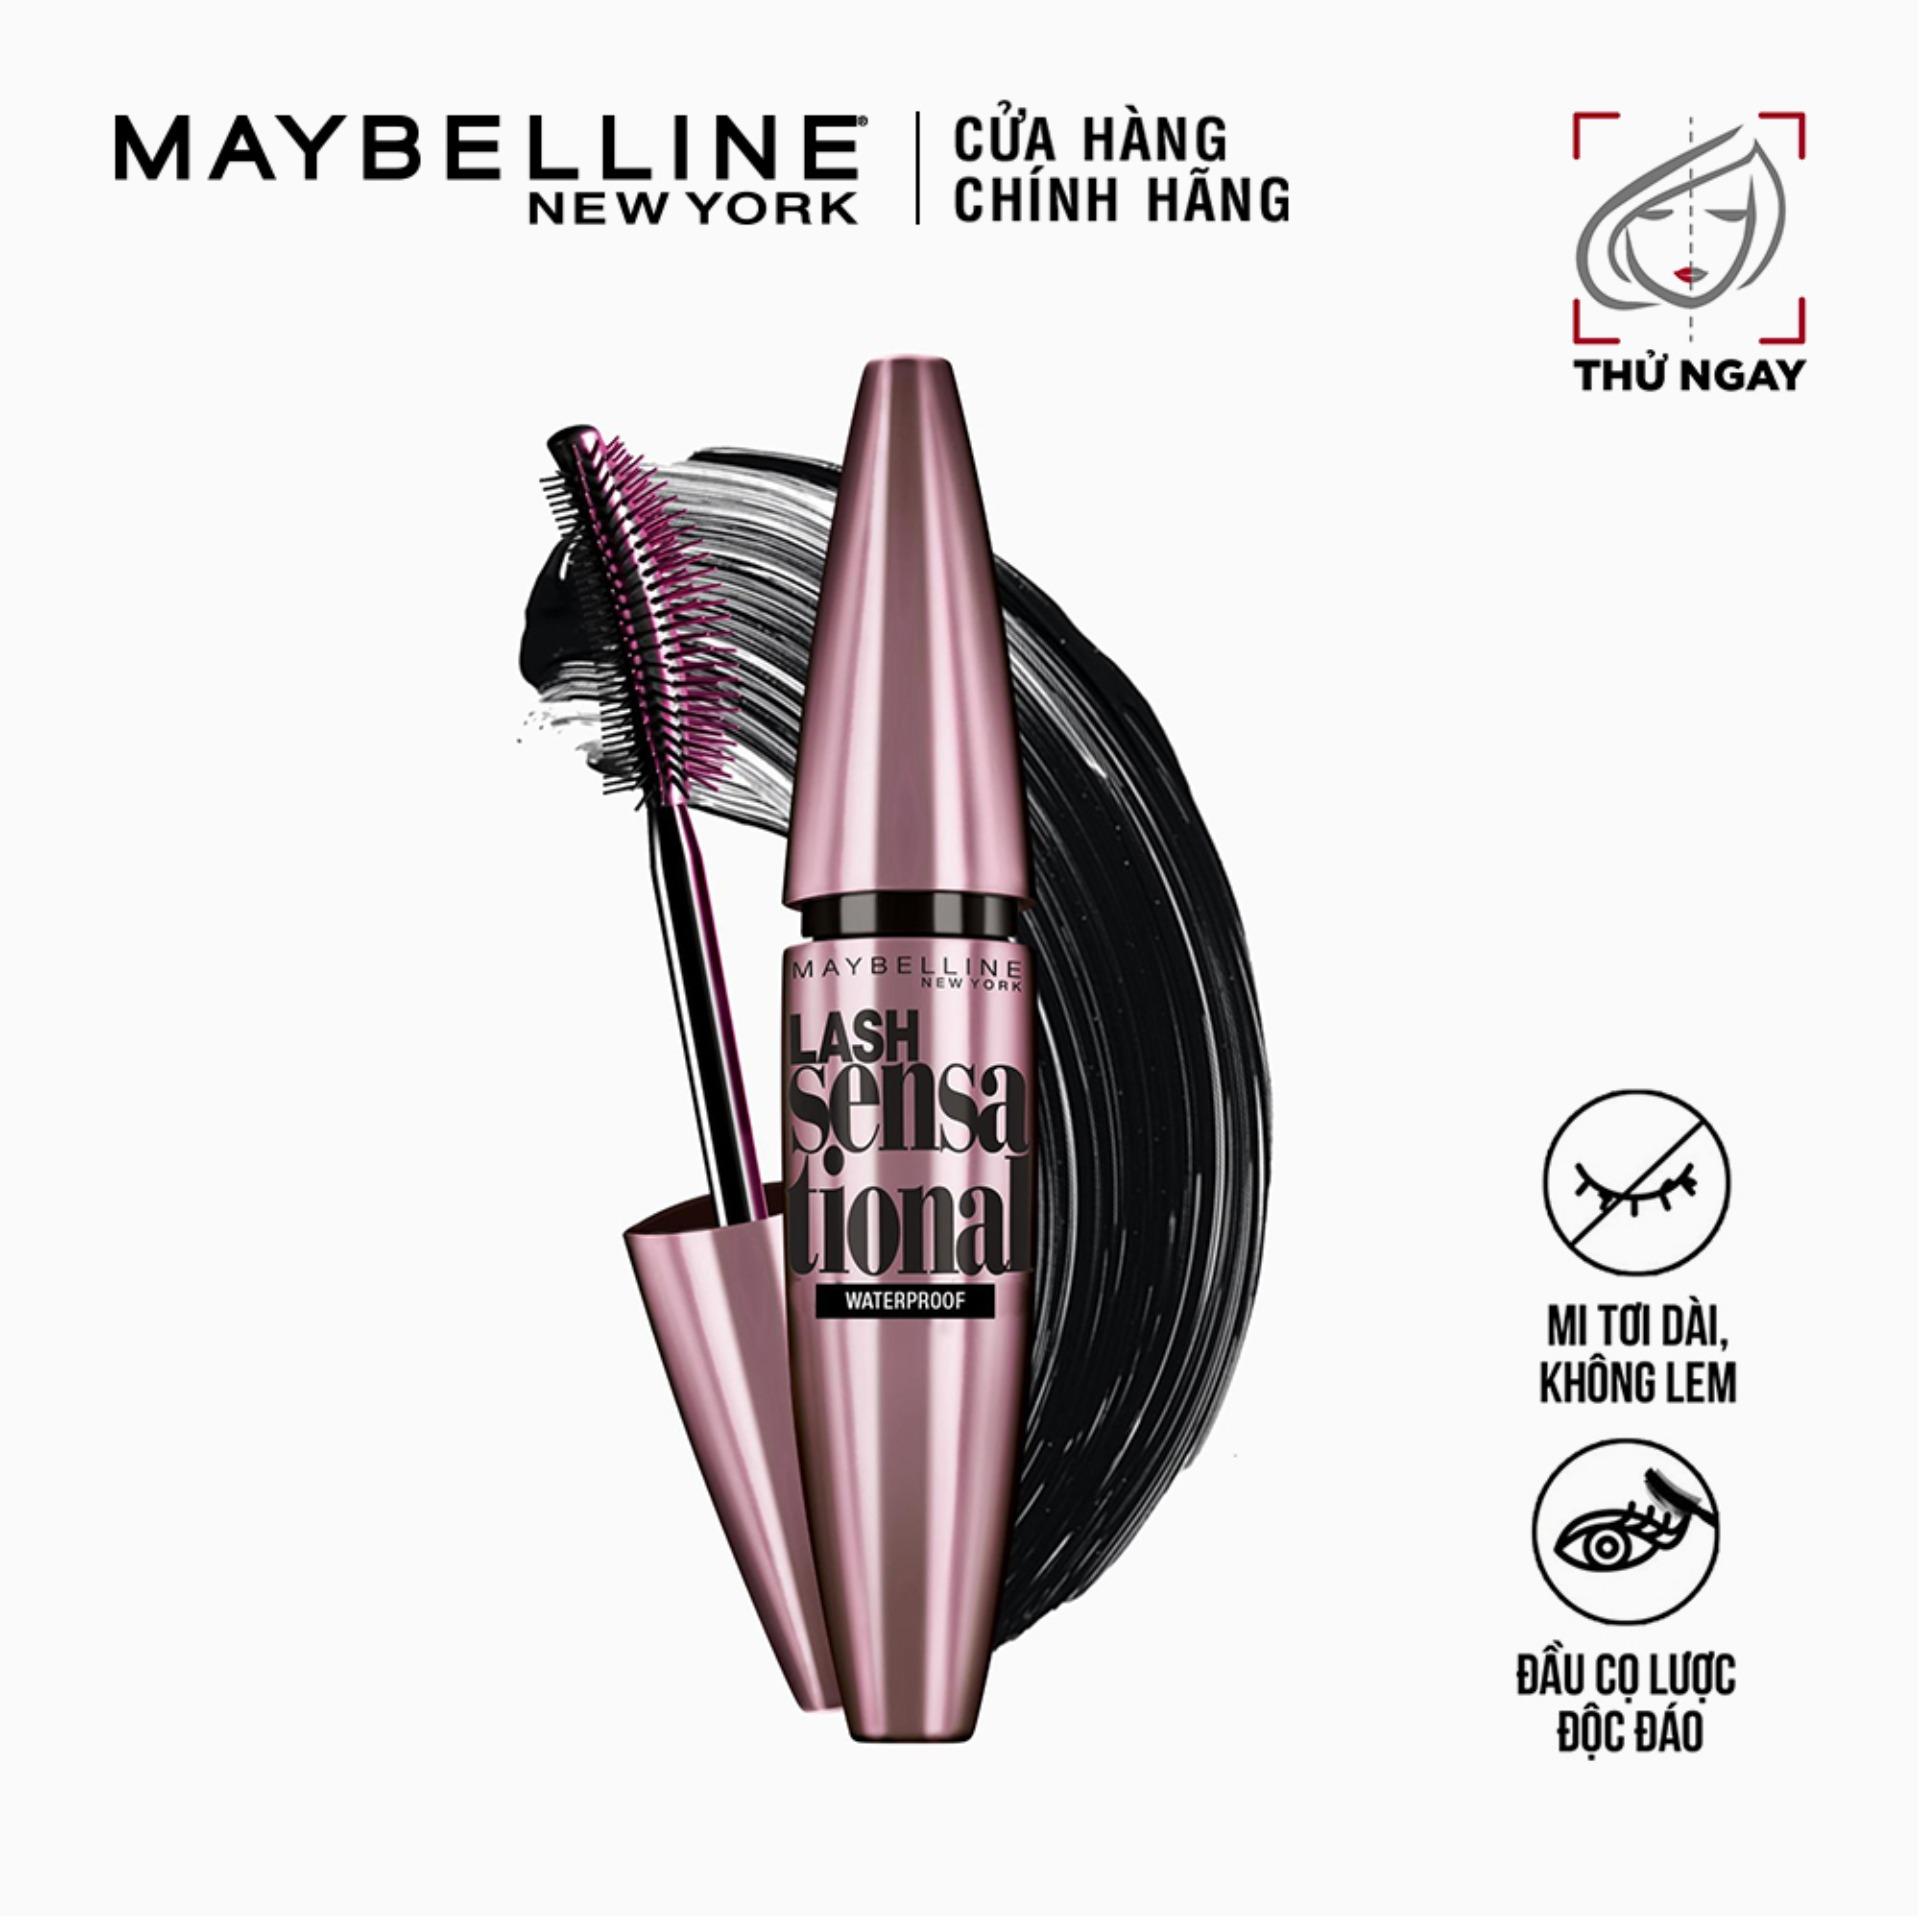 Mascara Dài Mi & Tơi Mi Tự Nhiên Maybelline New York Lash Sensational Waterproof Chuốt Mi Không Lem Không Trôi